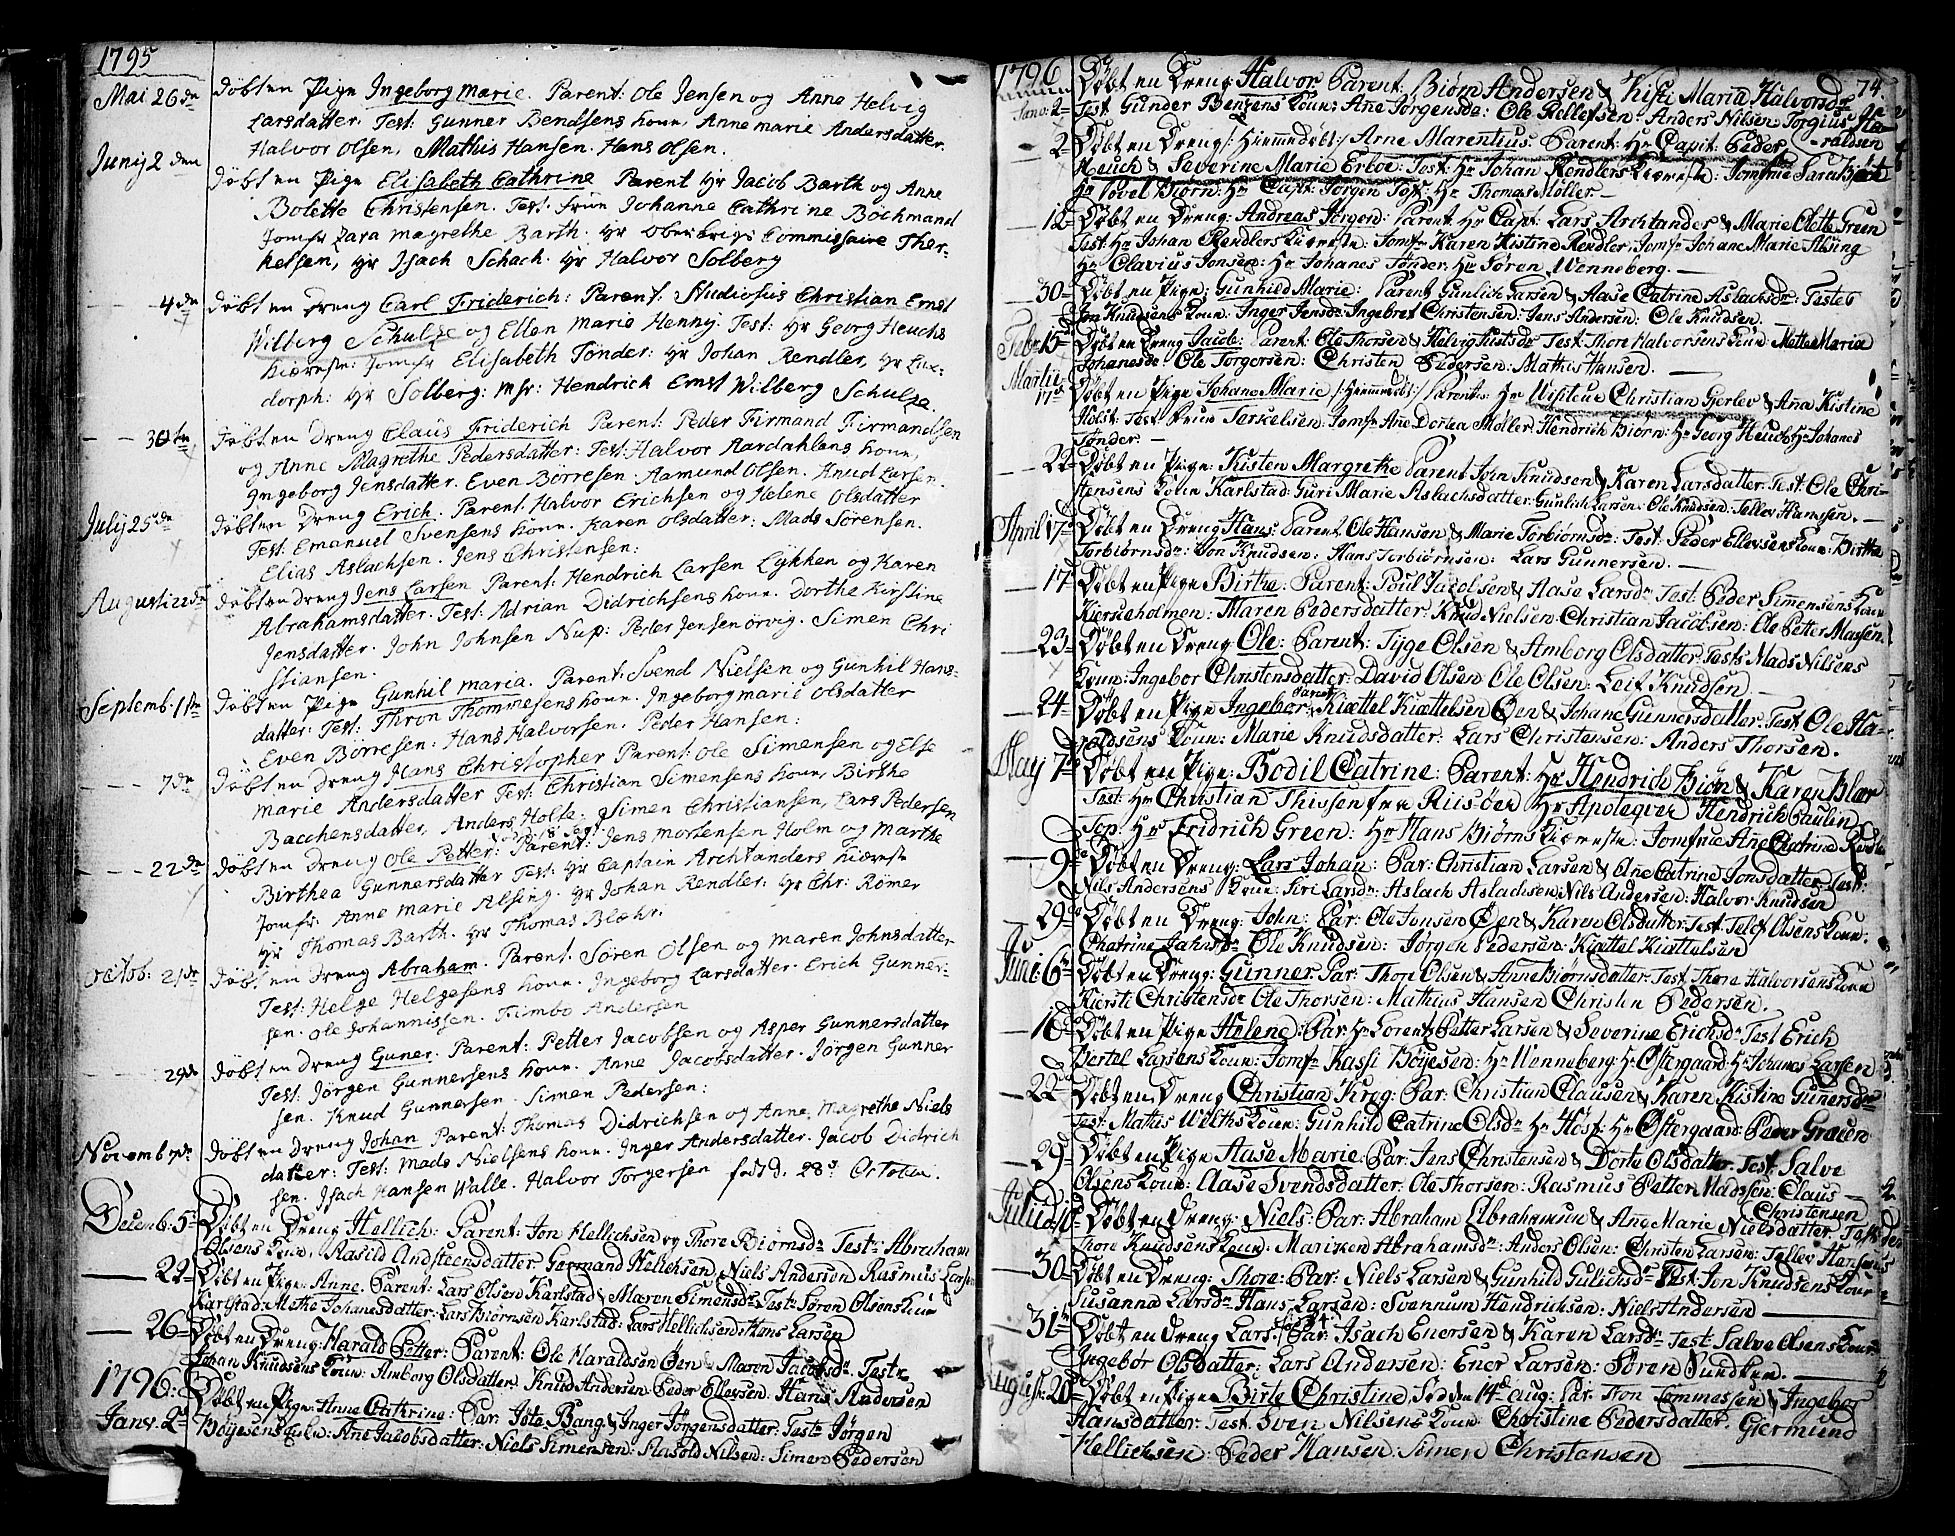 SAKO, Kragerø kirkebøker, F/Fa/L0002: Ministerialbok nr. 2, 1767-1802, s. 74